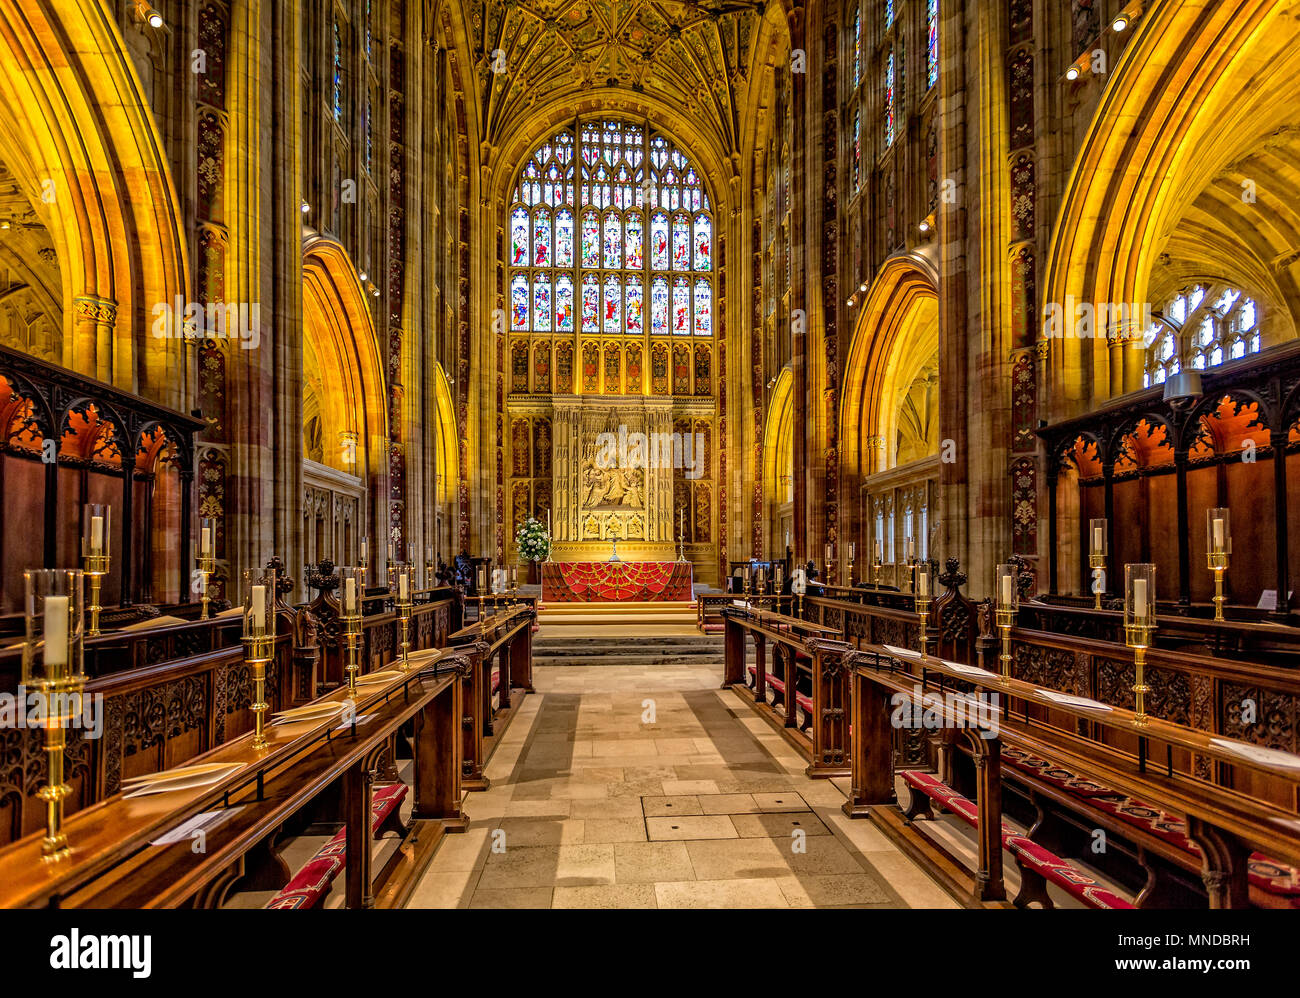 The choir stalls and altar in Sherborne Abbey taken in Sherborne, Dorset, UK on 24 August 2015 Stock Photo